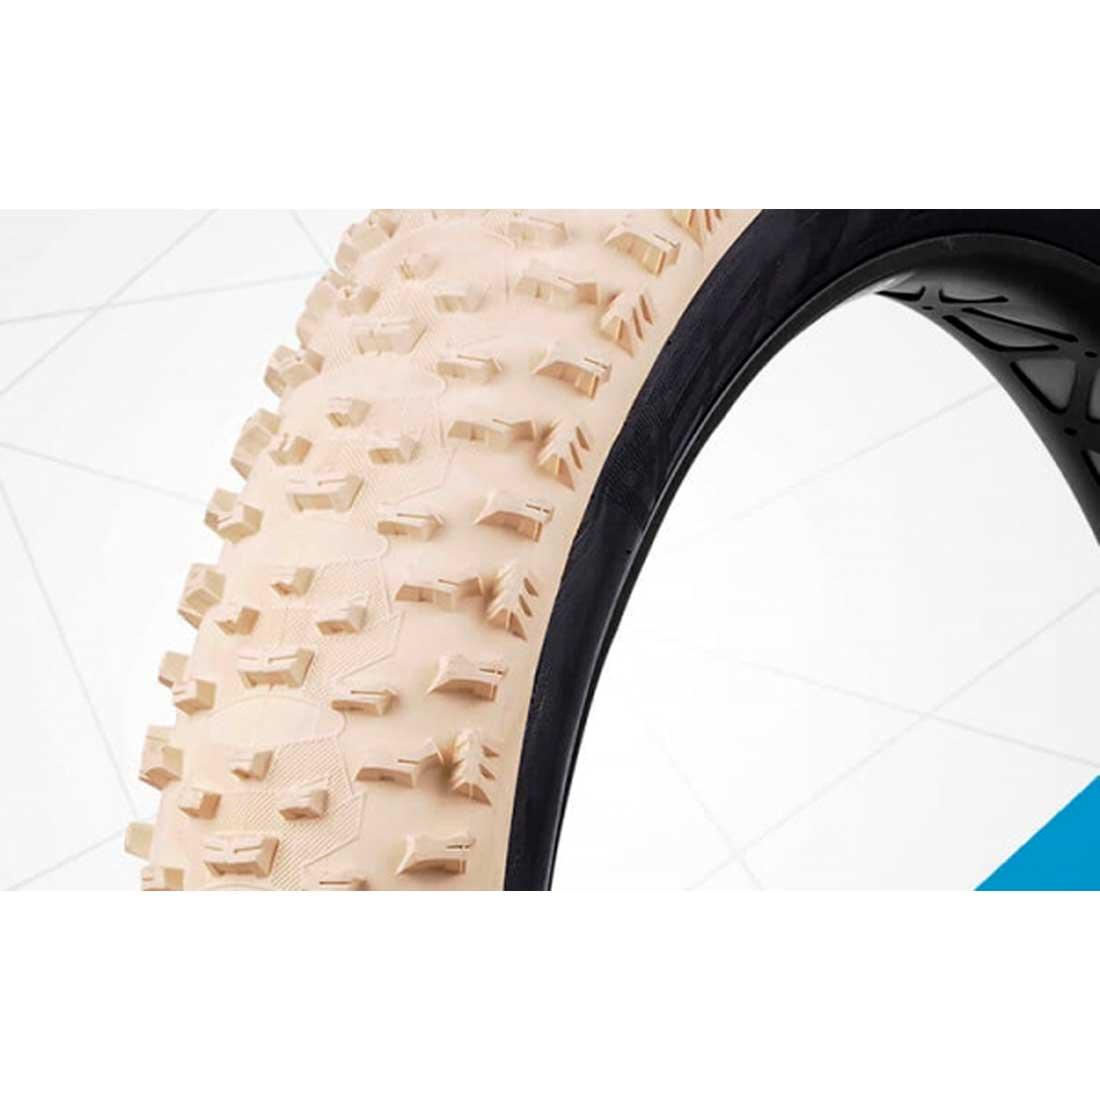 【VEE RUBBER ファットタイヤ】VEE SNOWSHOE 2XL 26×5.05 Pure-Slica自転車 ファットバイク 26インチ タイヤ